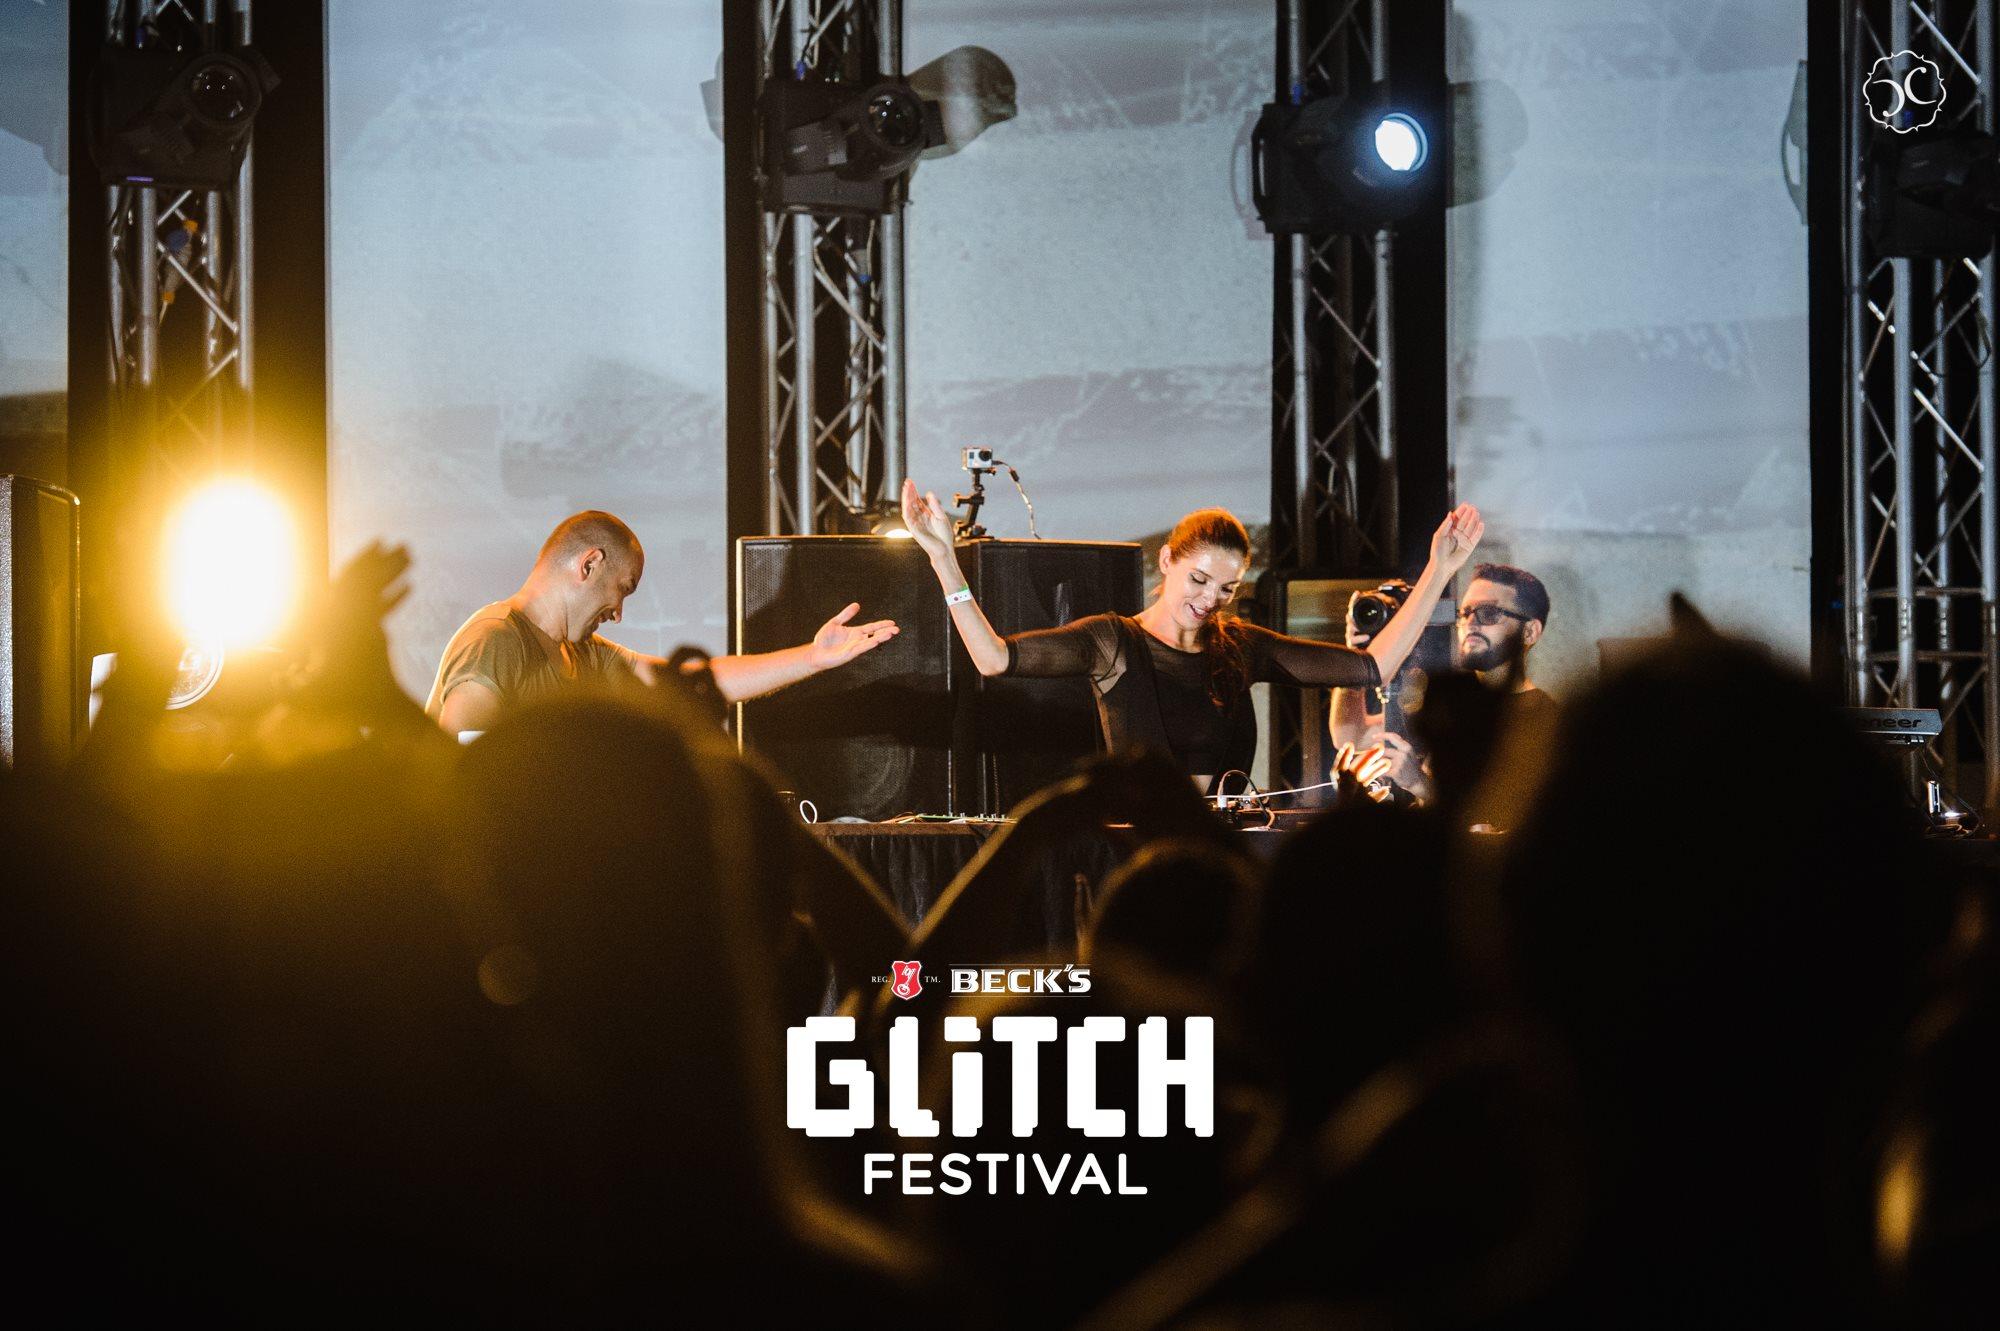 Kink rachel row live glitch festival malta